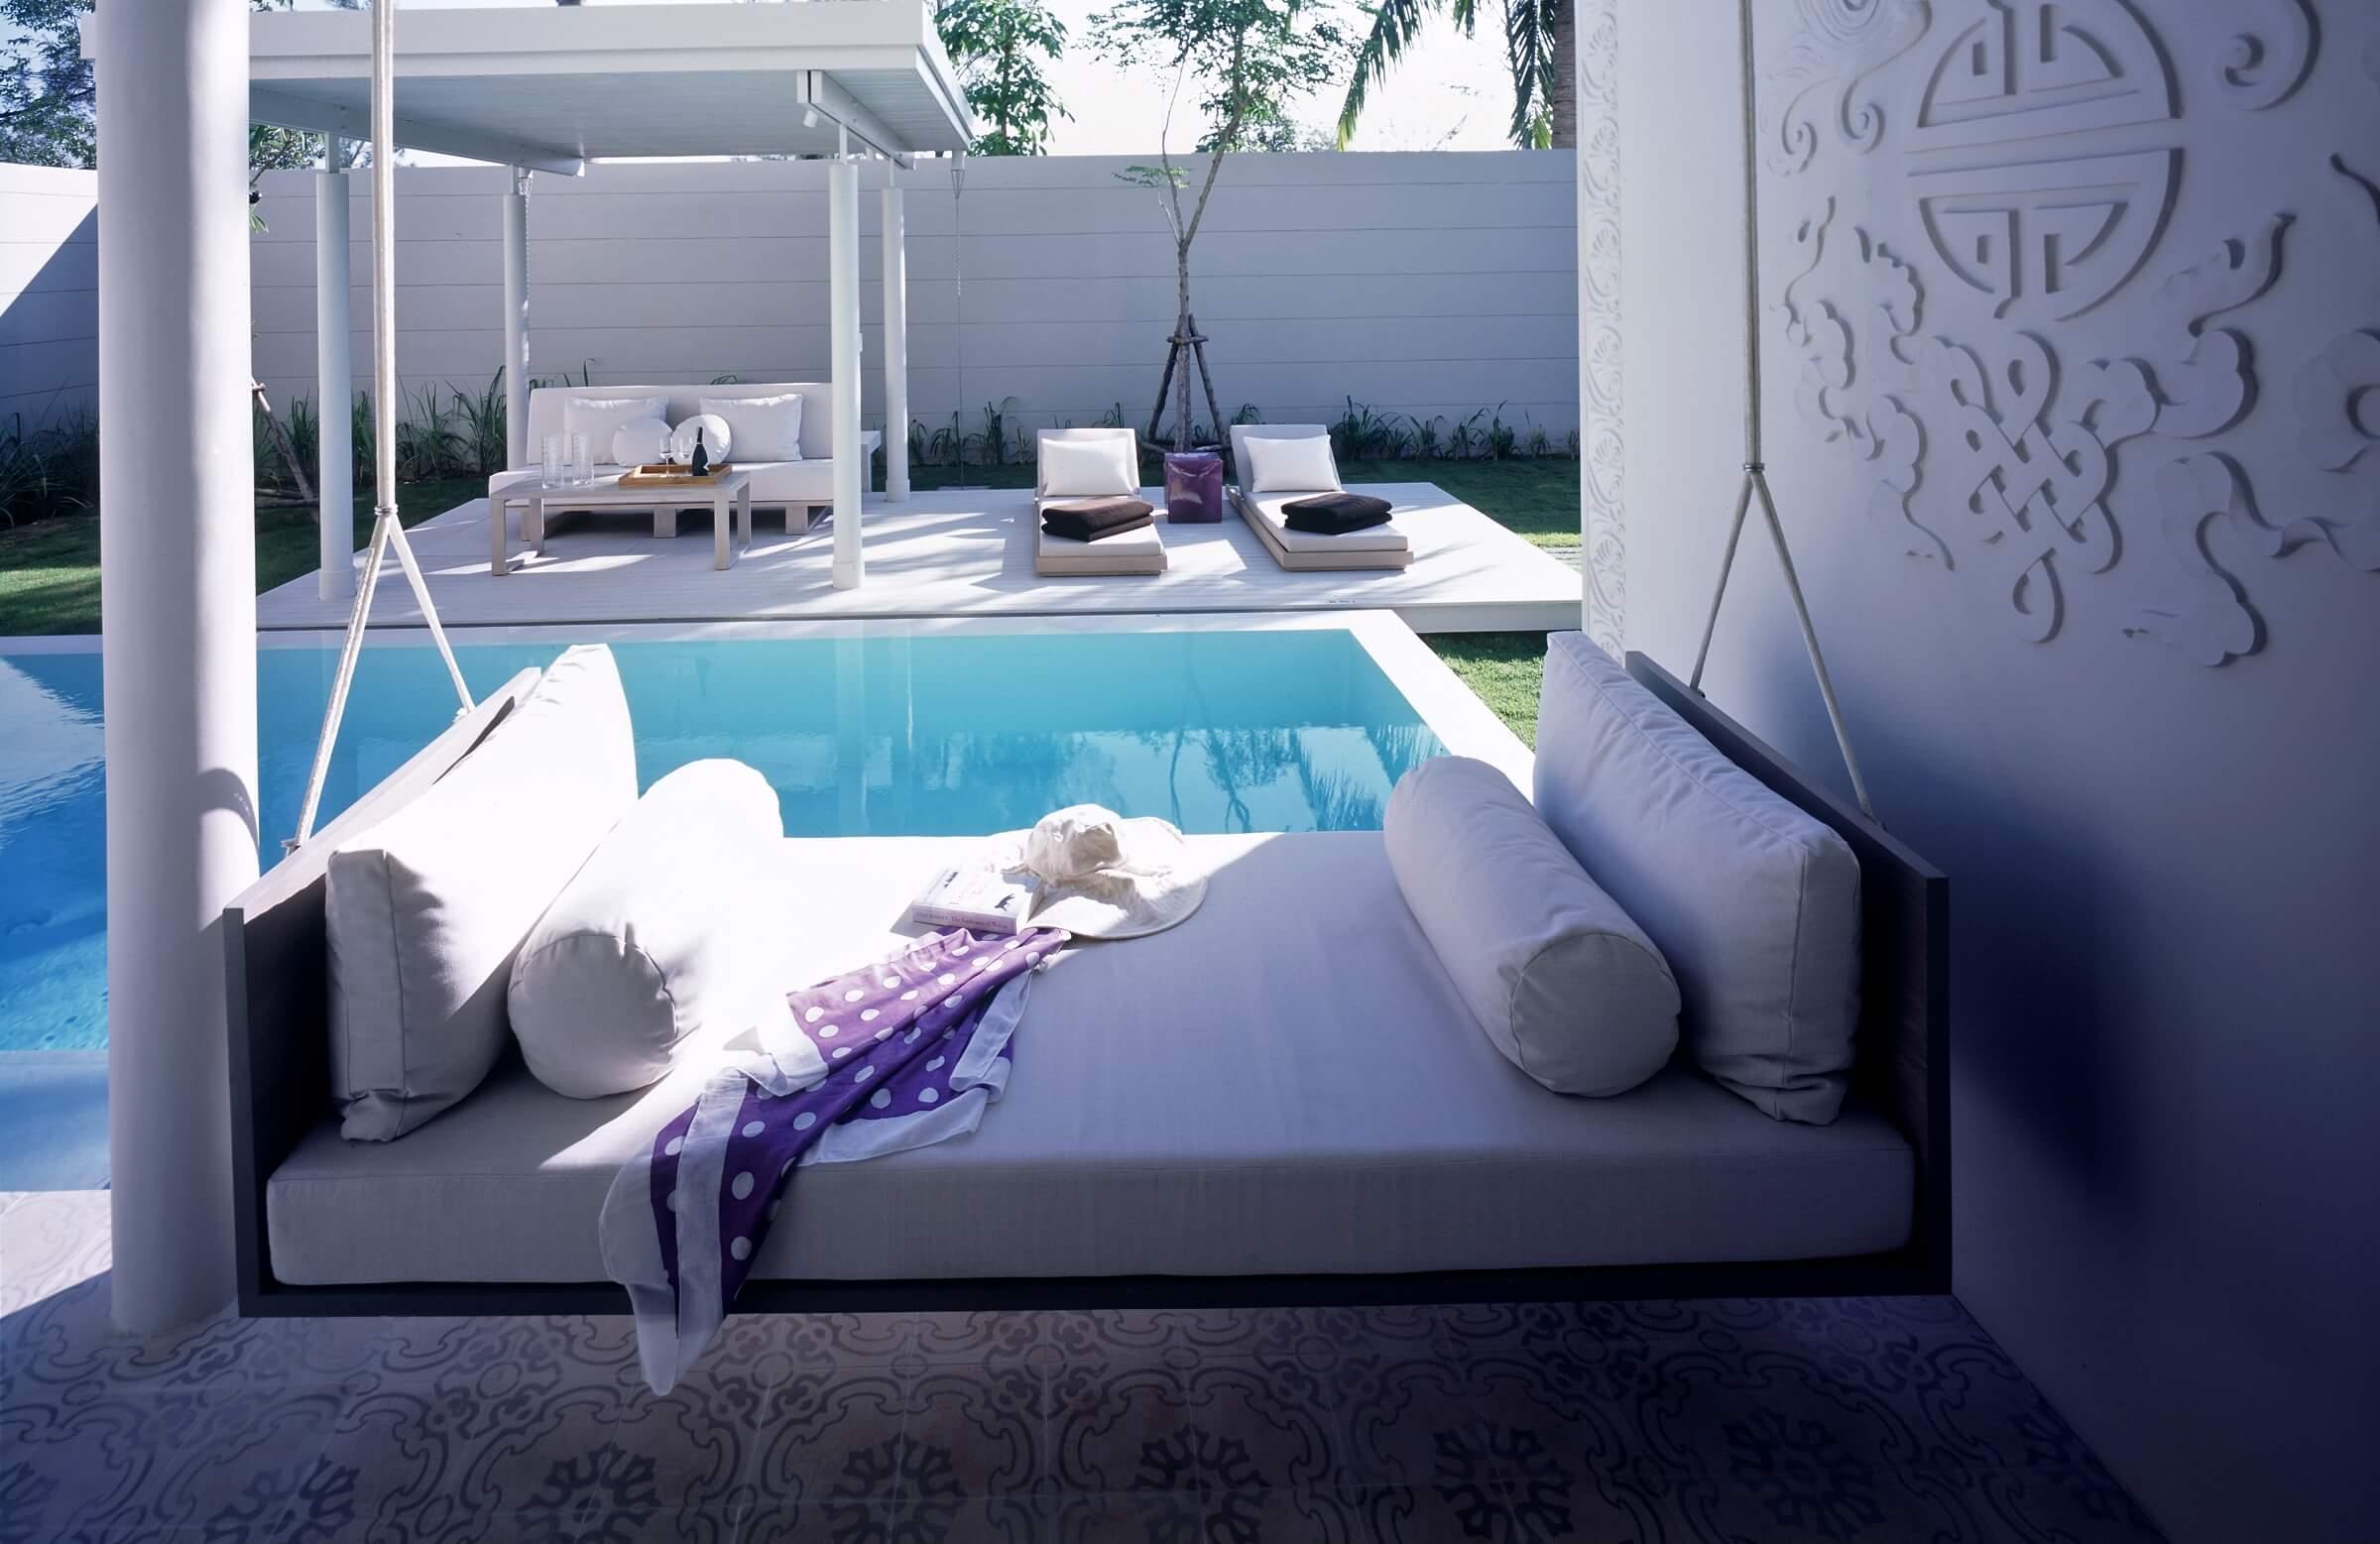 main 1 bedroom duplex pool villa suite jpg